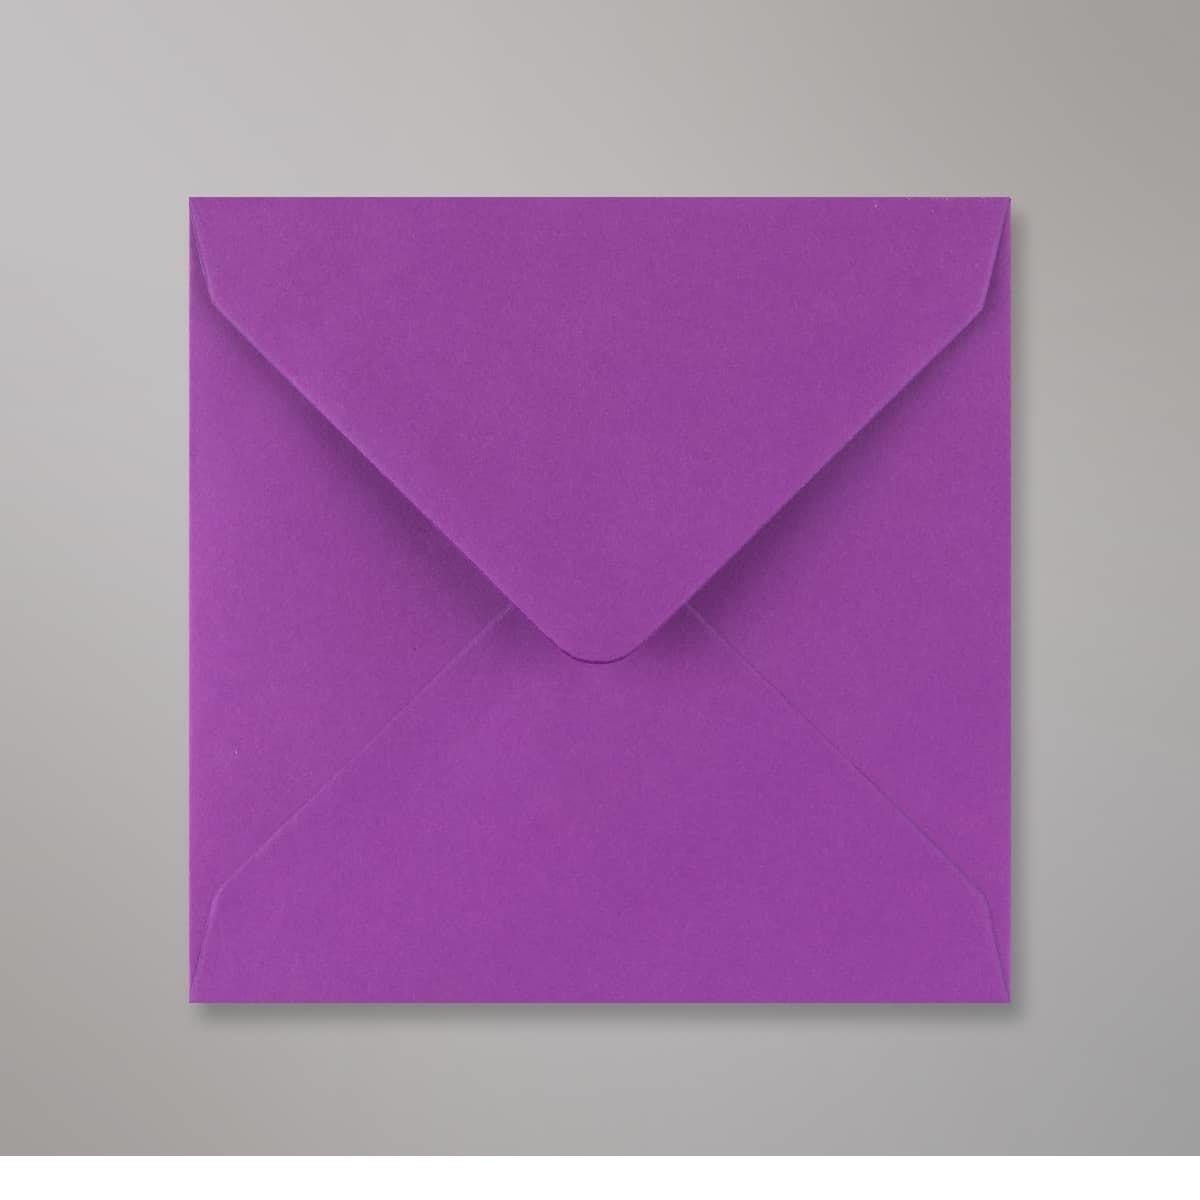 Enveloppe violette 130x130 mm